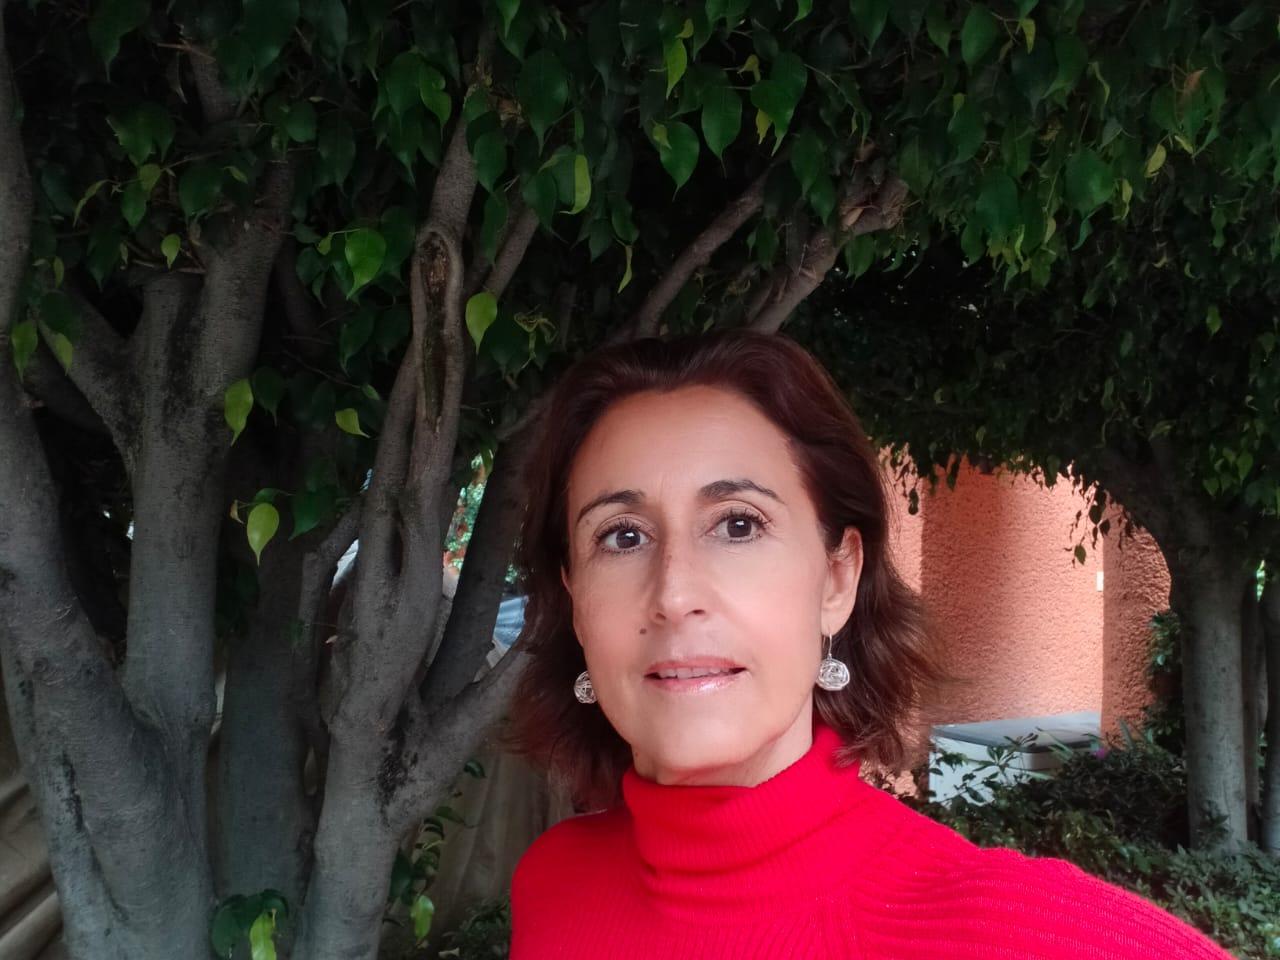 Estela Almeida